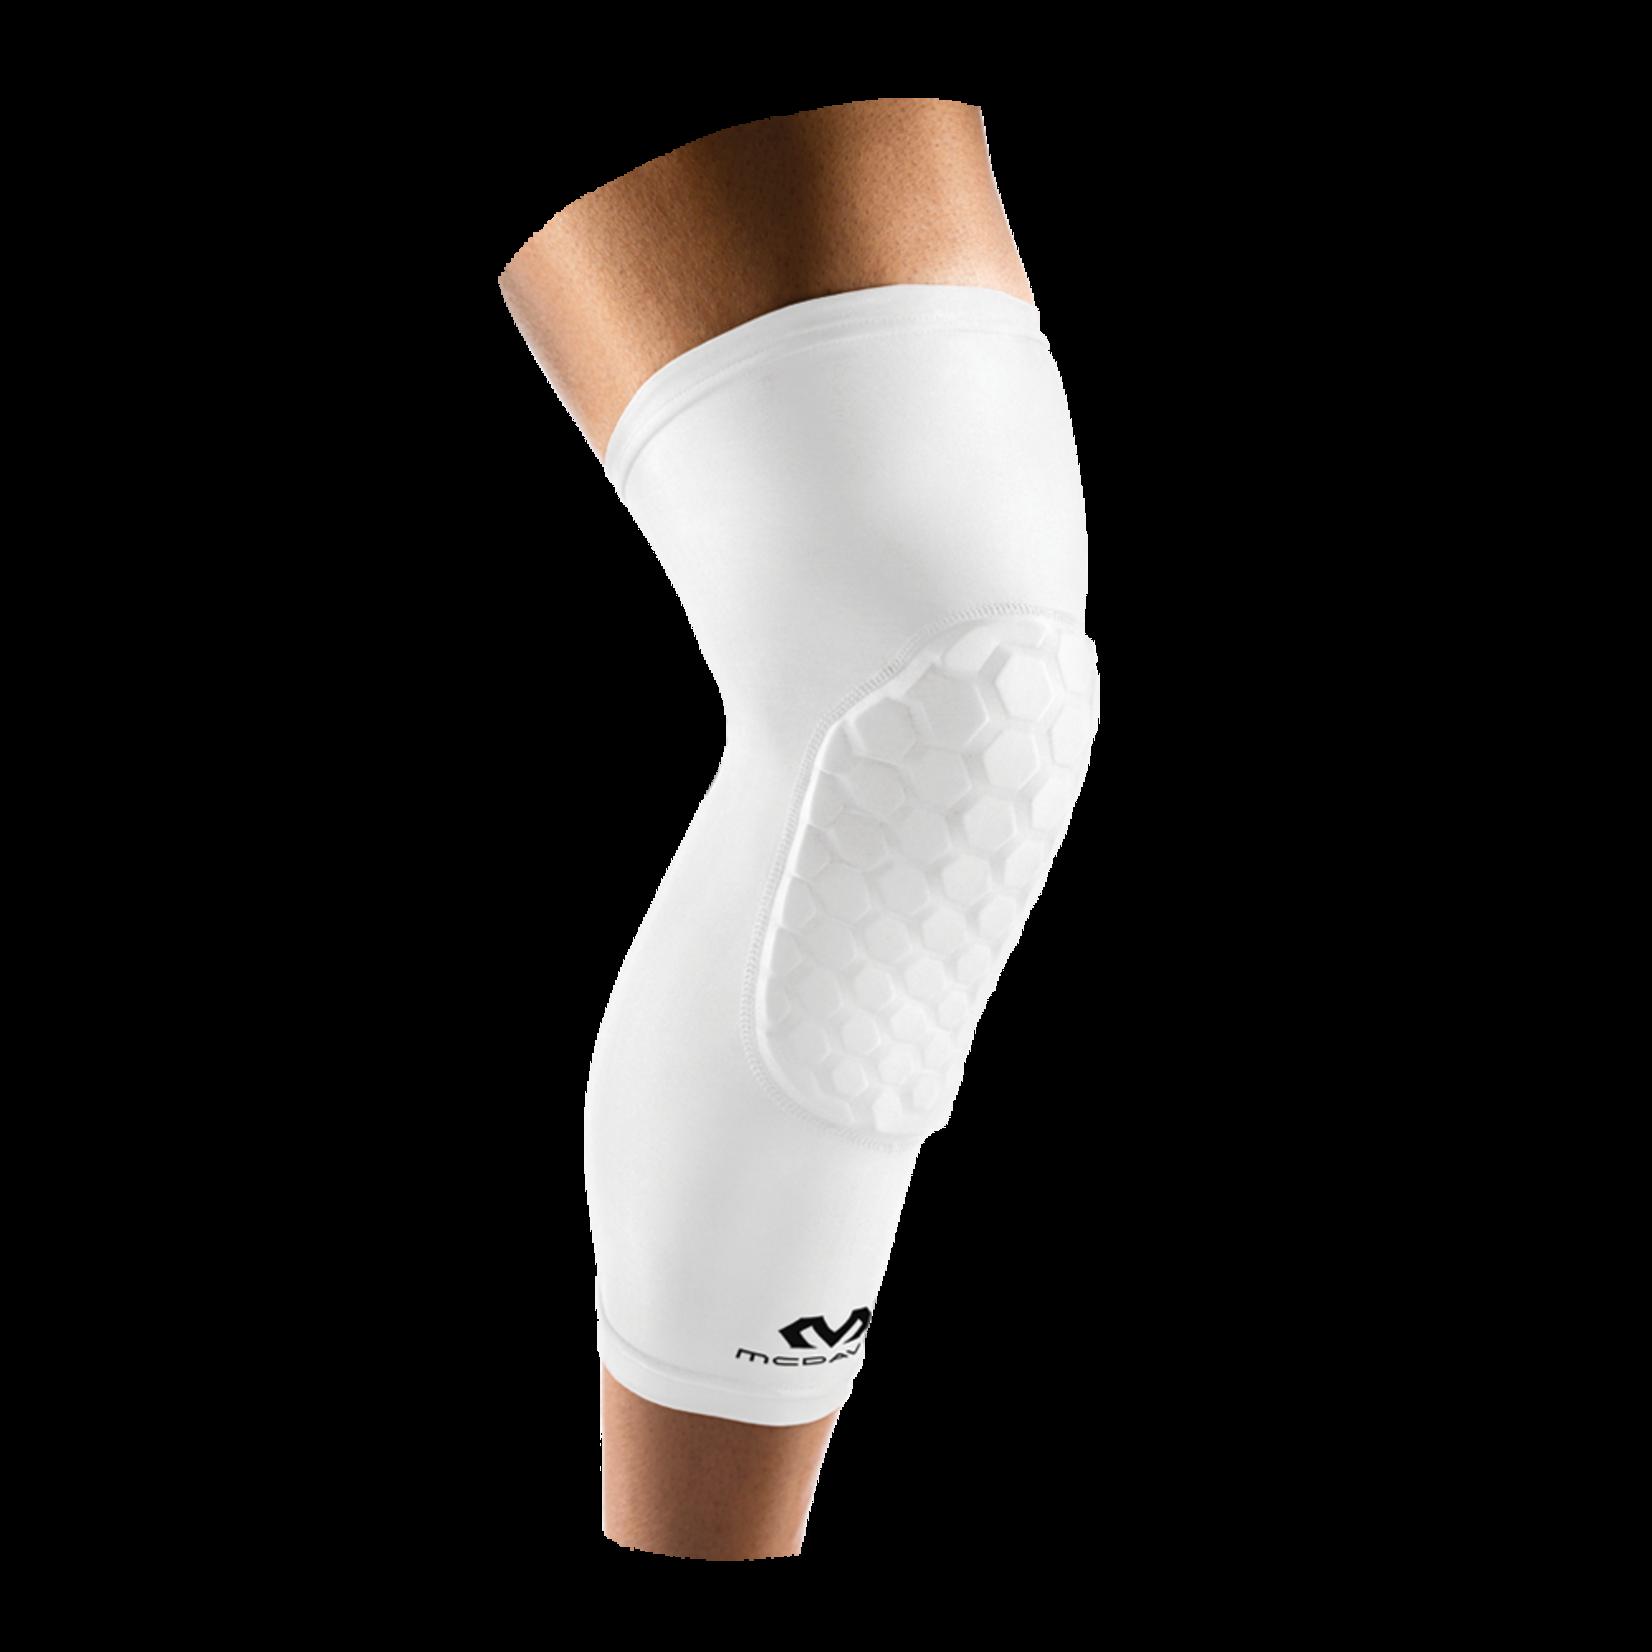 McDavid McDavid Hex Leg Sleeves, 1 Pair